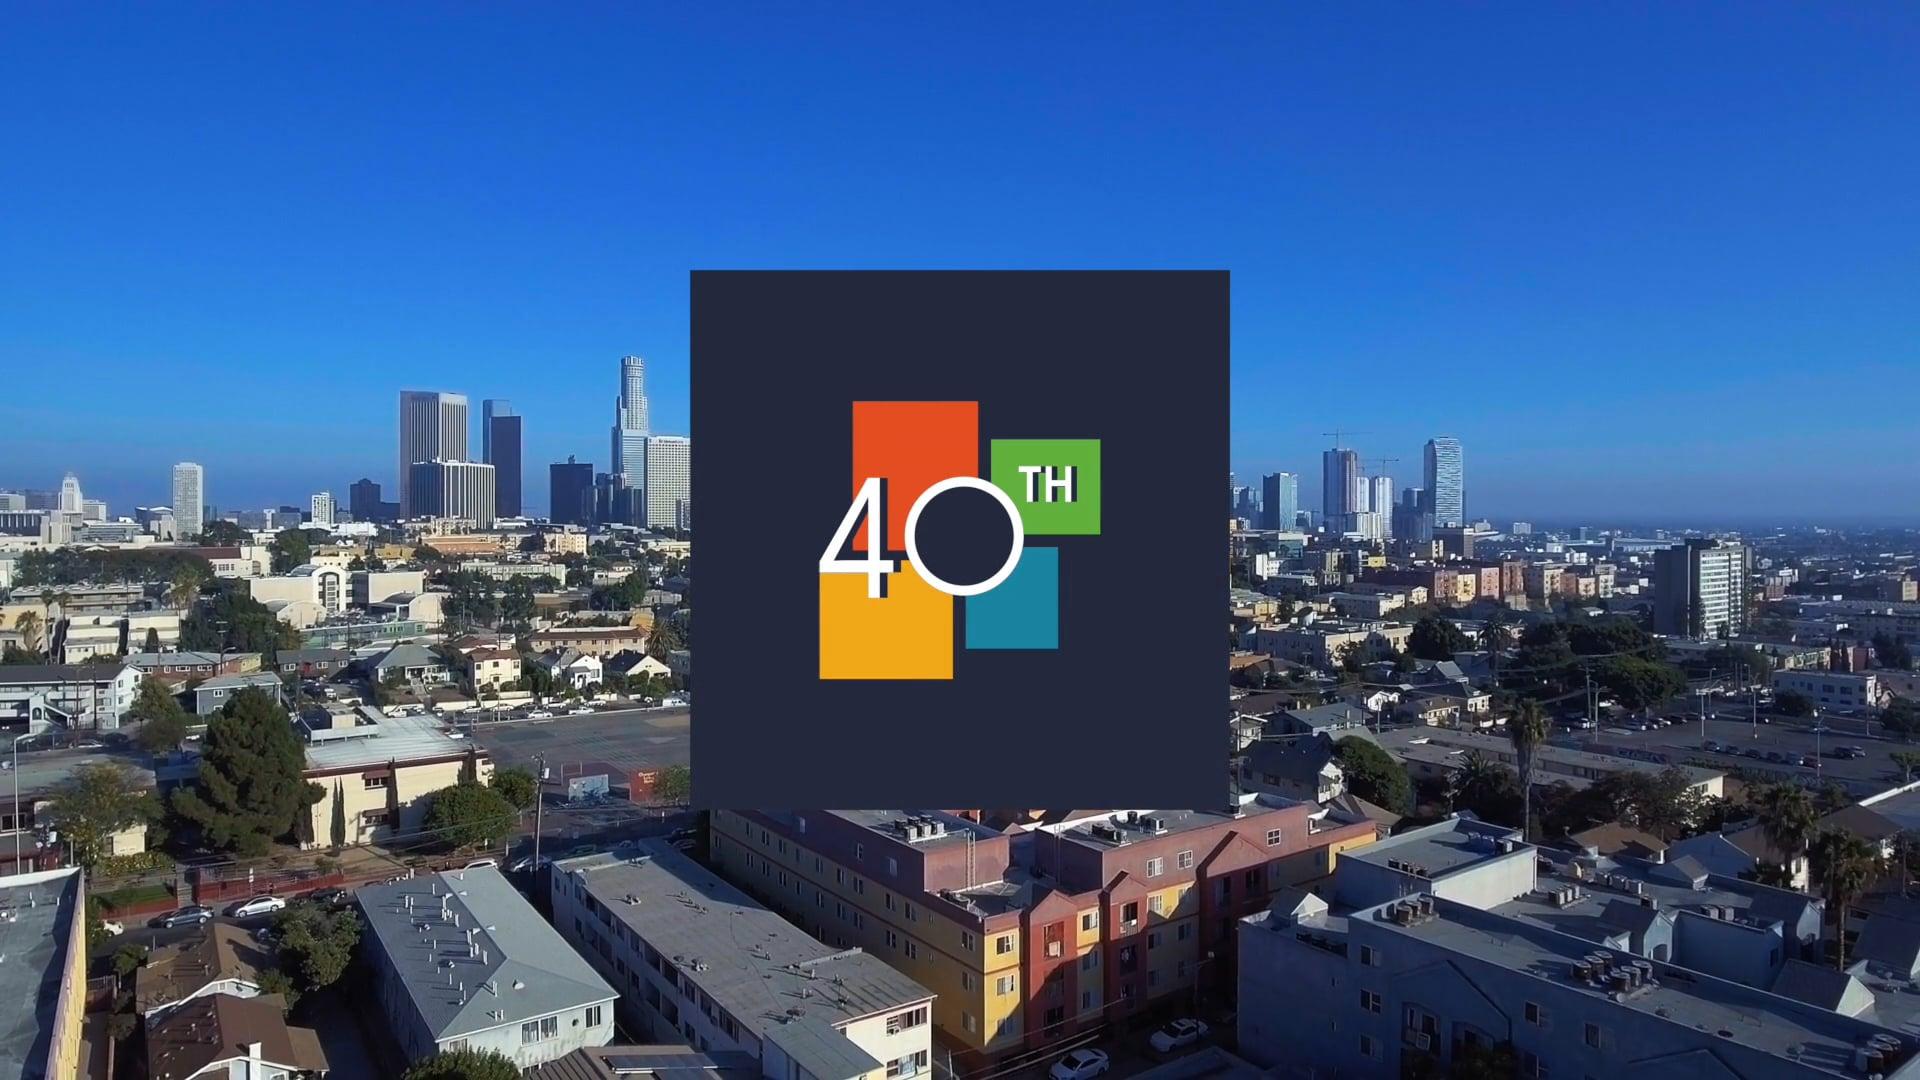 ALA 40th Anniversary Video